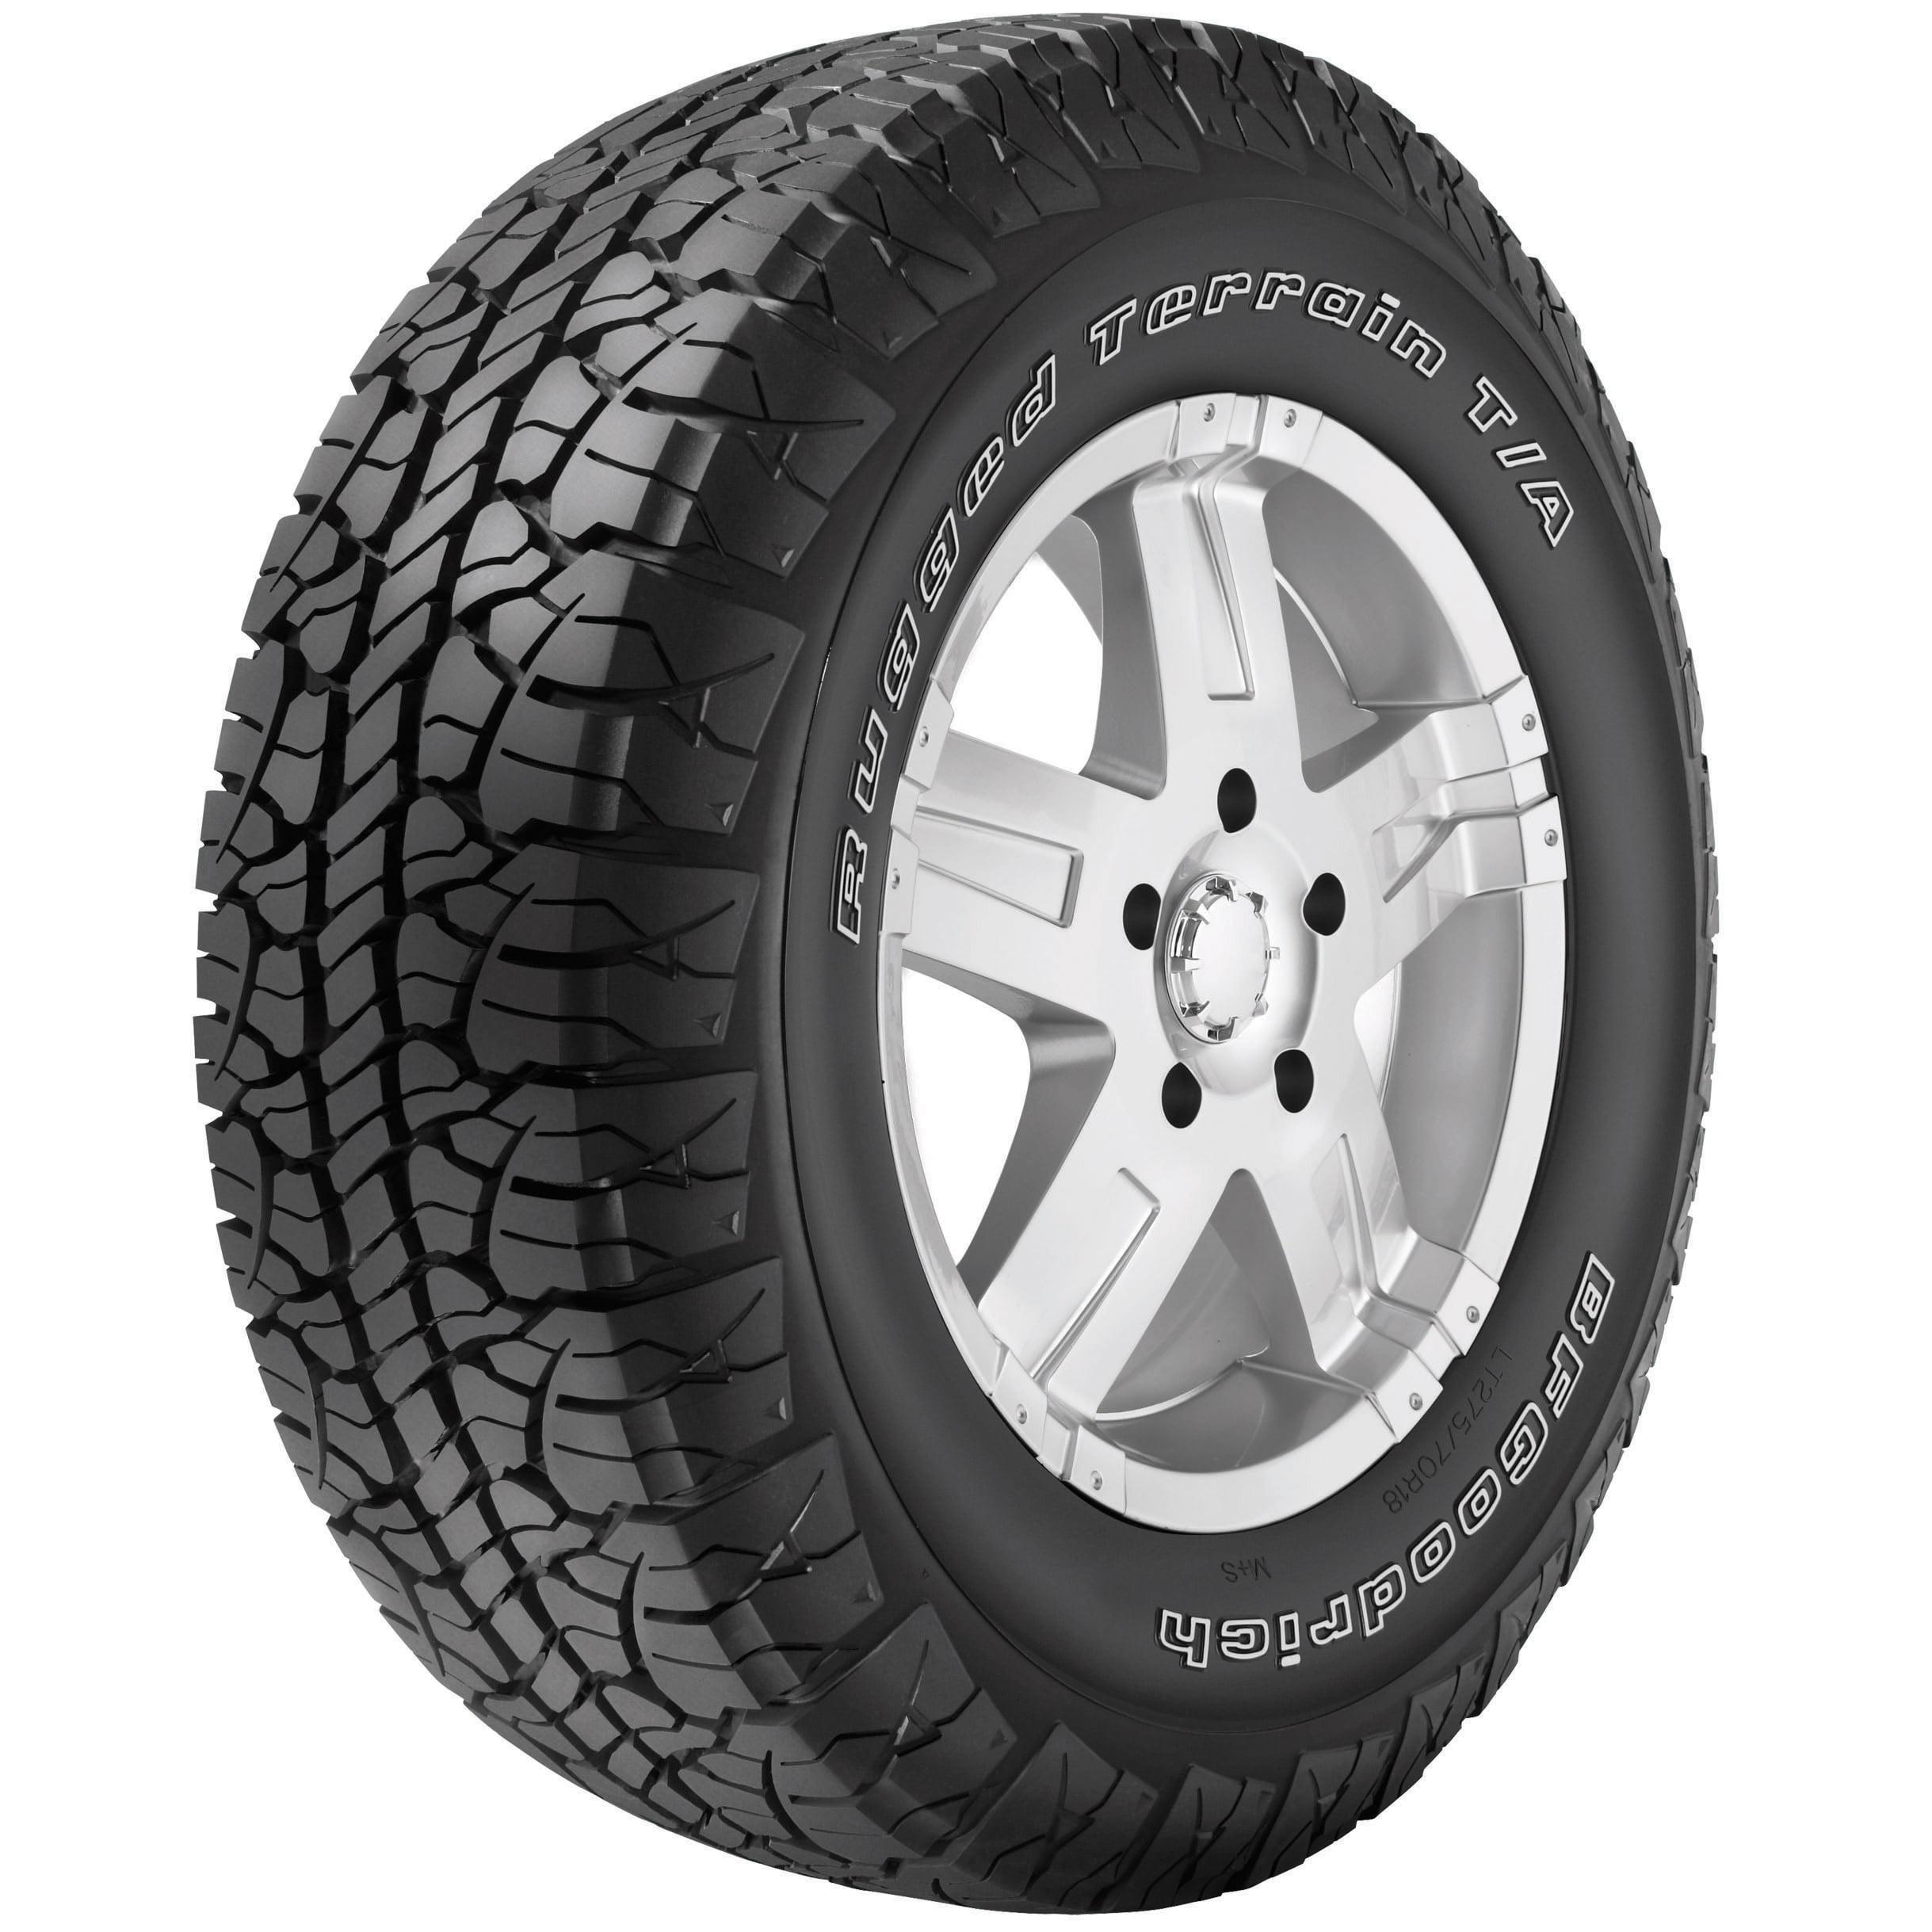 Motor Home And Rv Tires Walmart Com >> Bfgoodrich Rugged Terrain T A Tire P265 70r17 113t